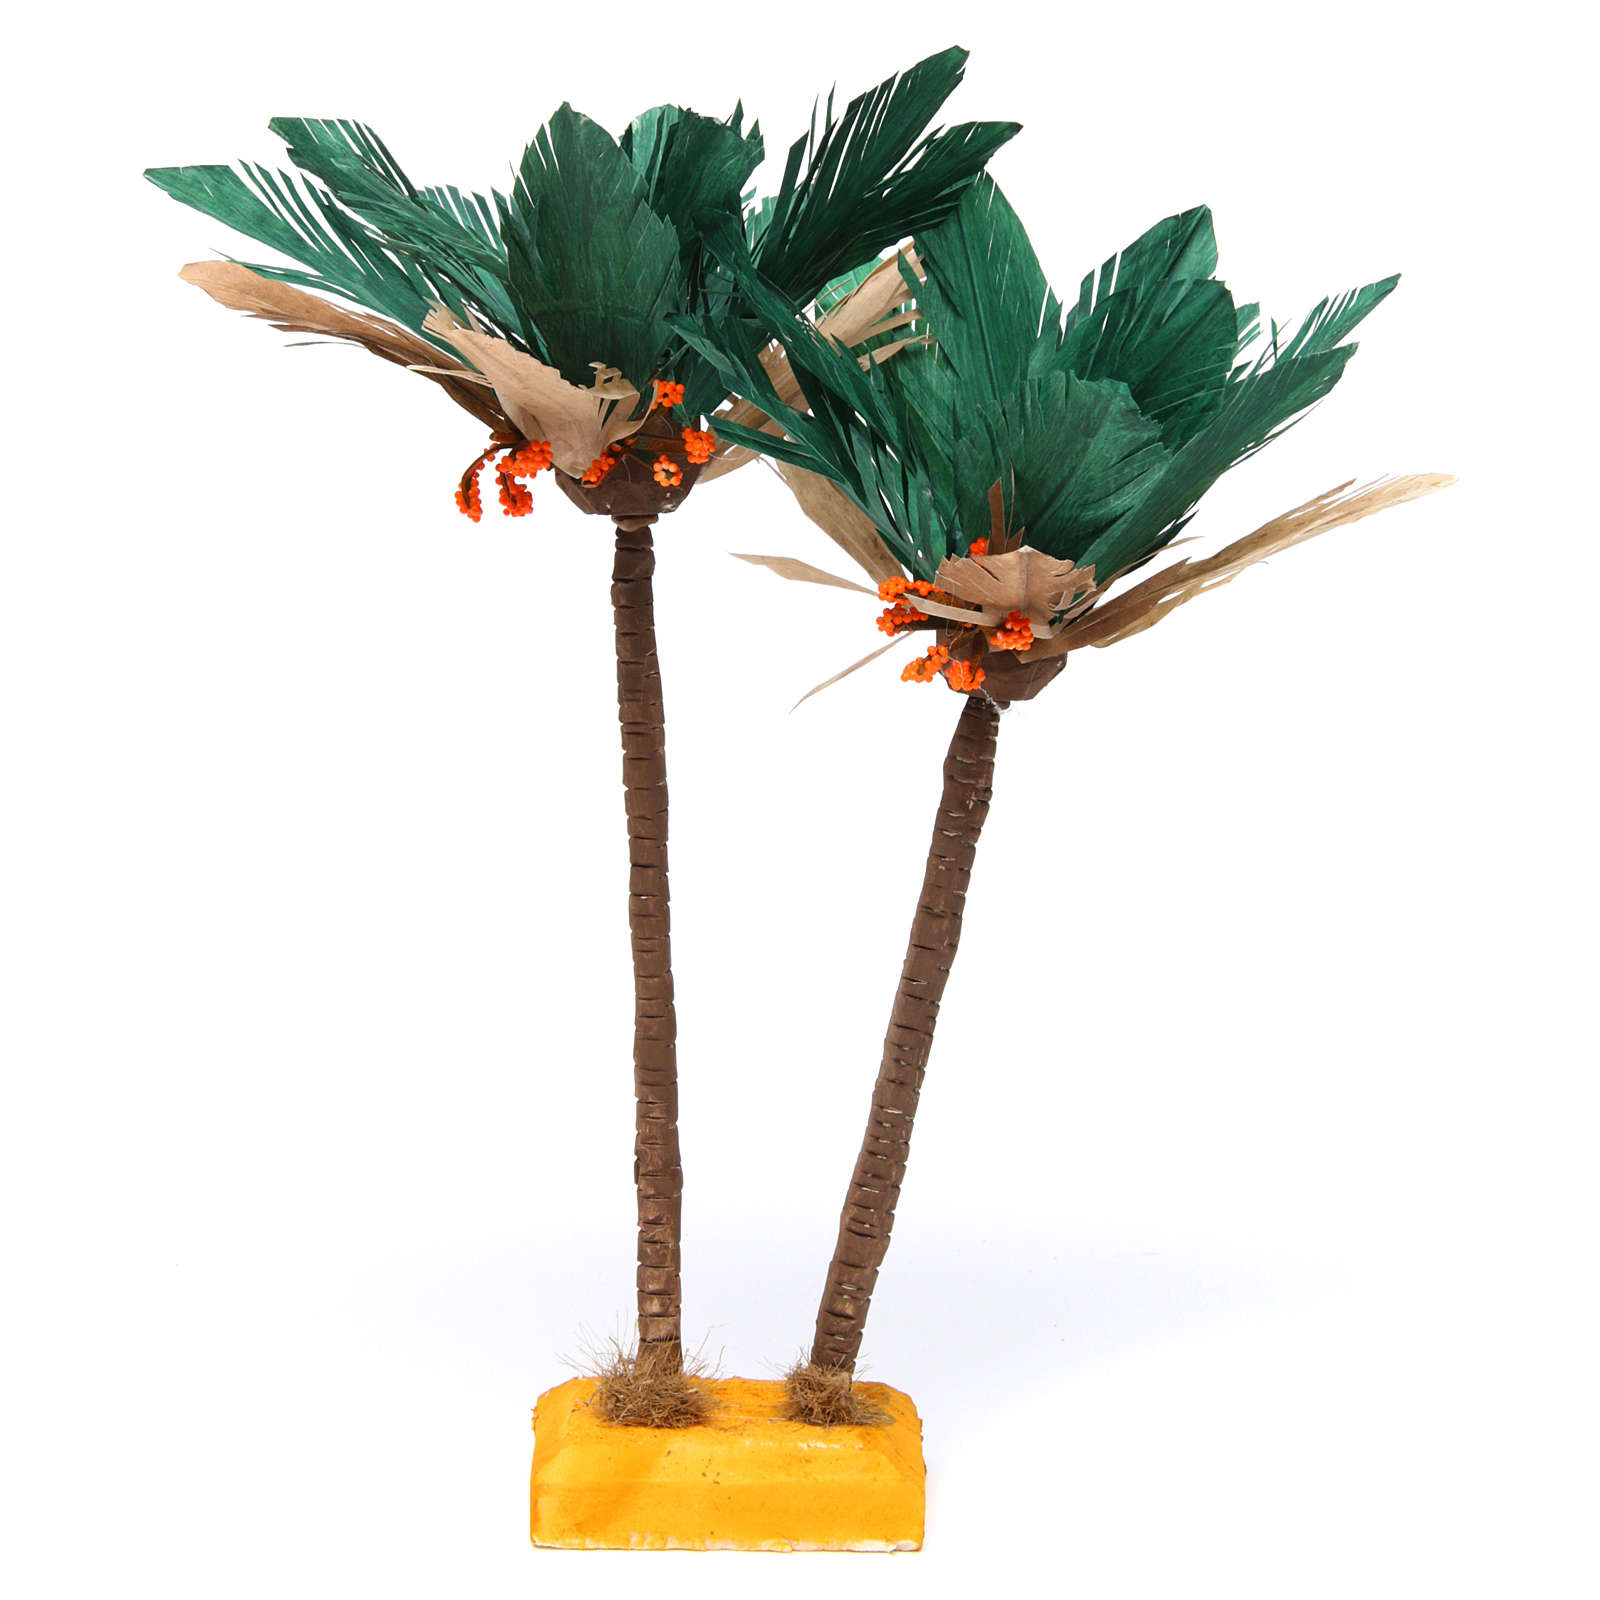 Palme presepe Napoli fai da te h reale 30 cm 4